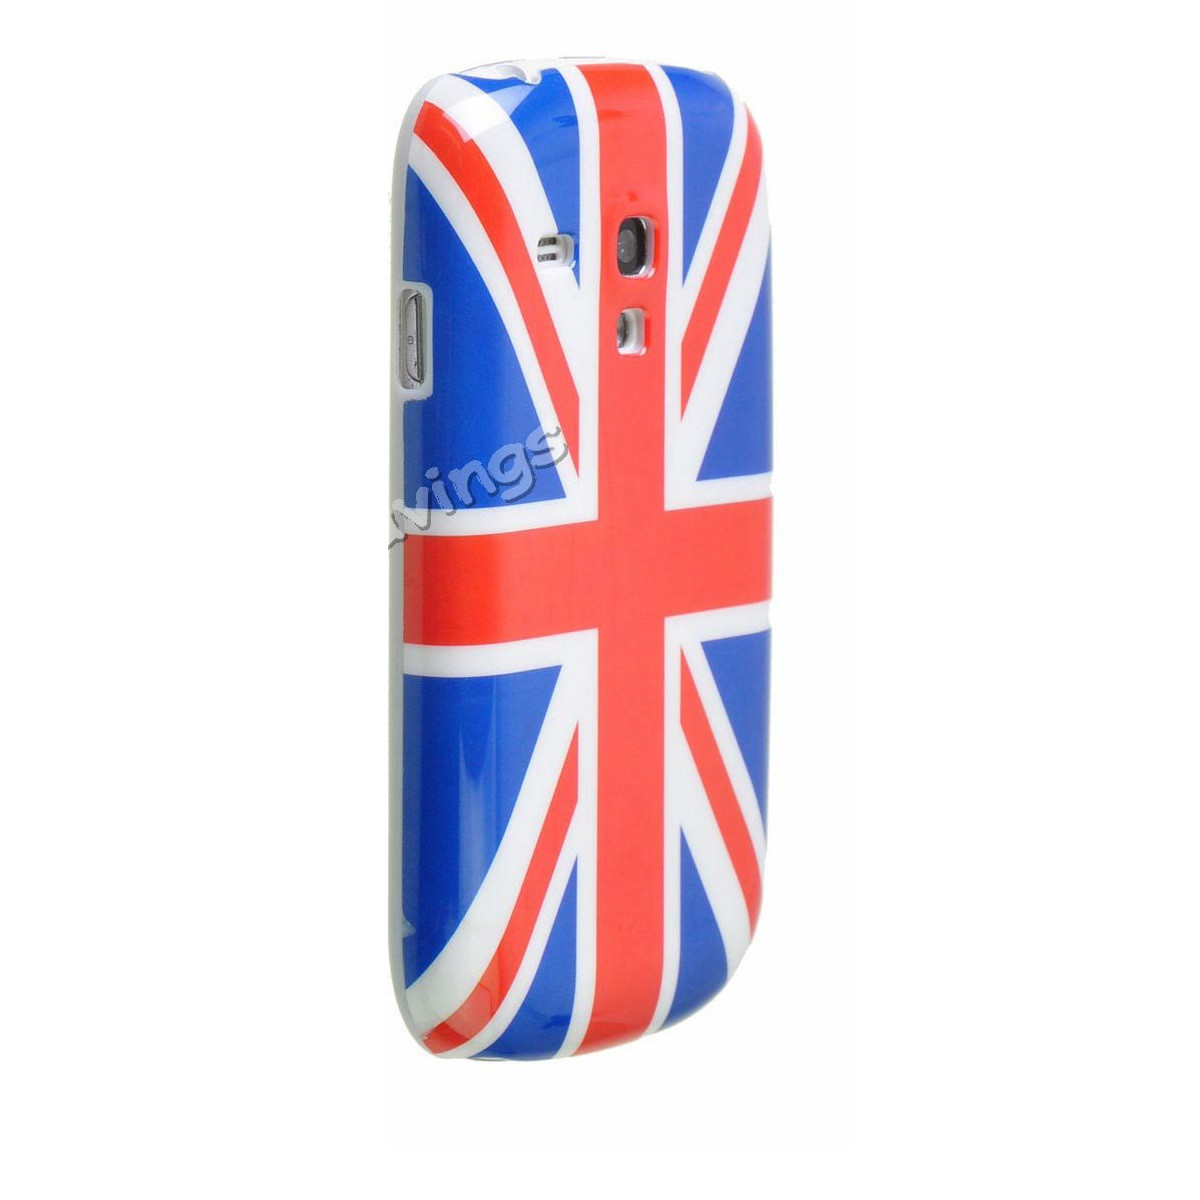 Чехол для Samsung Galaxy S3 mini I8190, G553